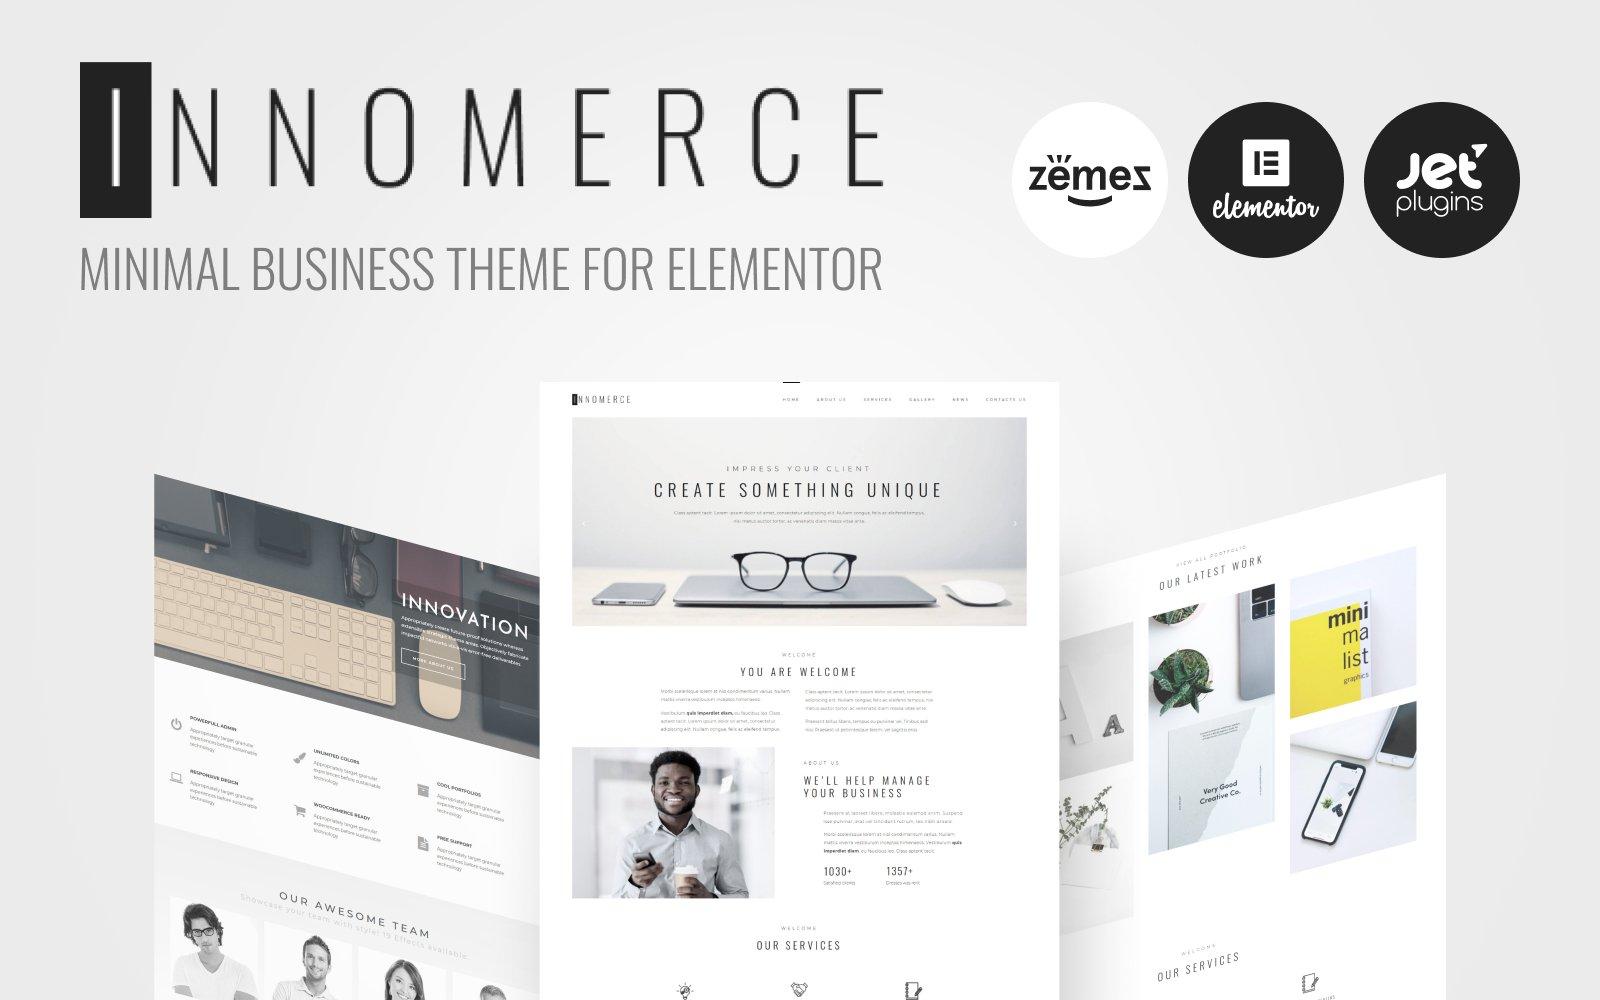 """Innomerce - Business Multipurpose Minimal Elementor"" 响应式WordPress模板 #81170 - 截图"